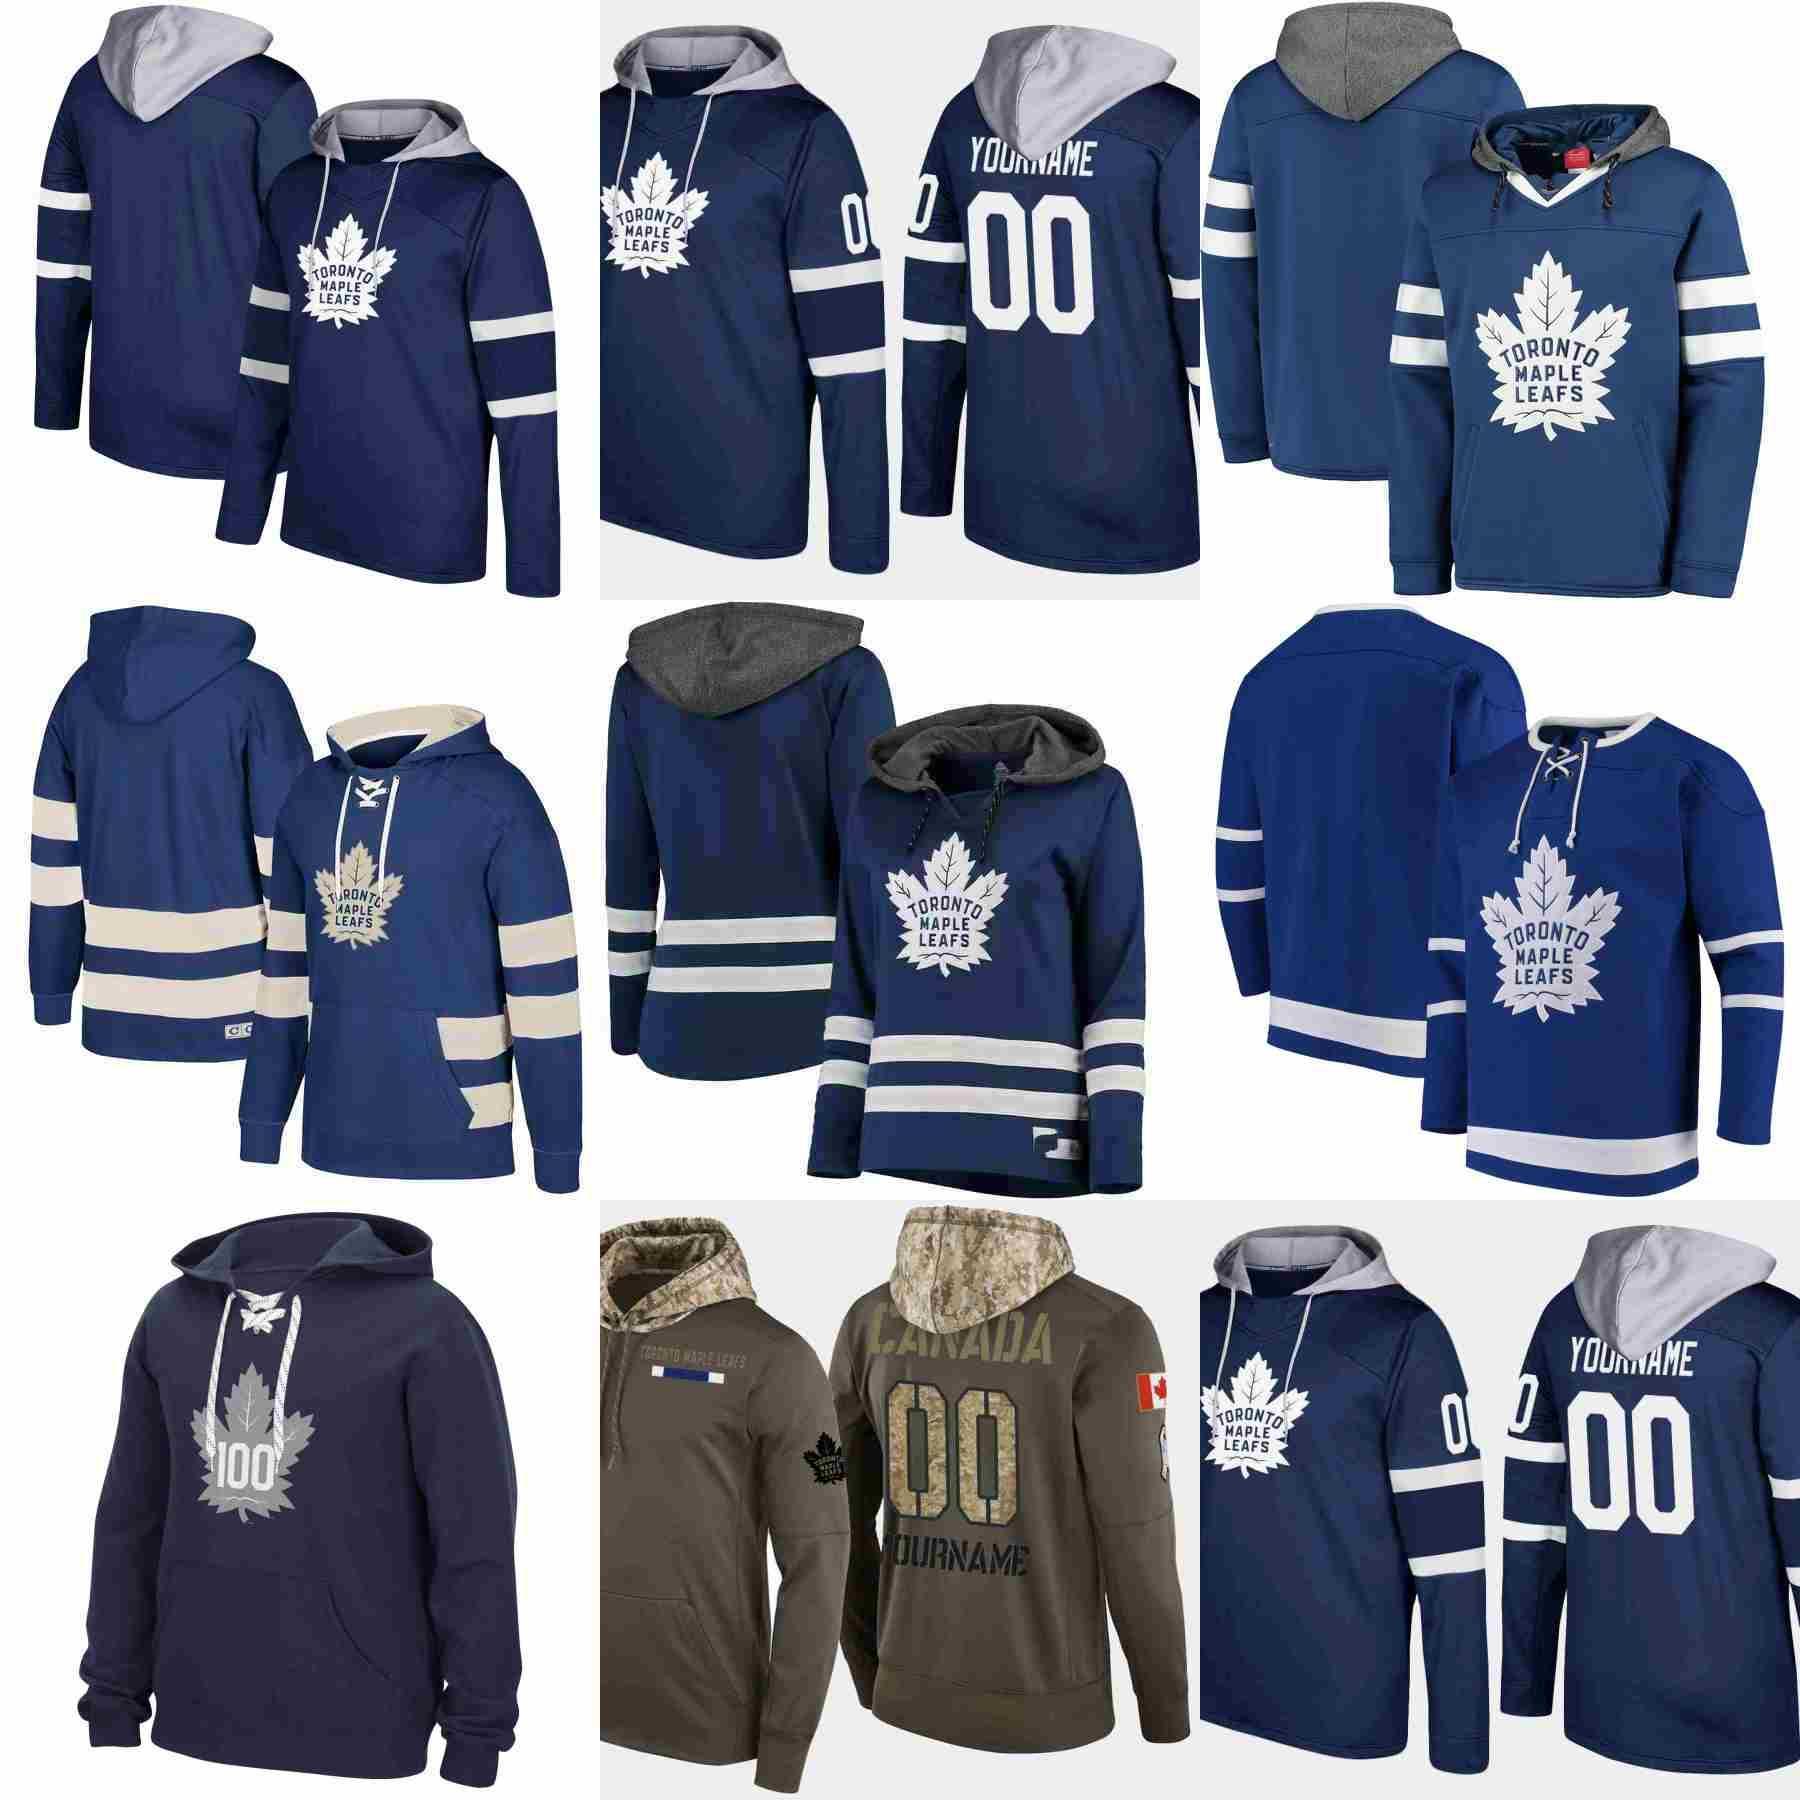 new concept 994c4 f9310 Toronto Maple Leafs hoodie 91 Tavares A patch 34Auston Matthews Mitchell  Marner william nylander Hockey Jersey Sweatshirt stitched